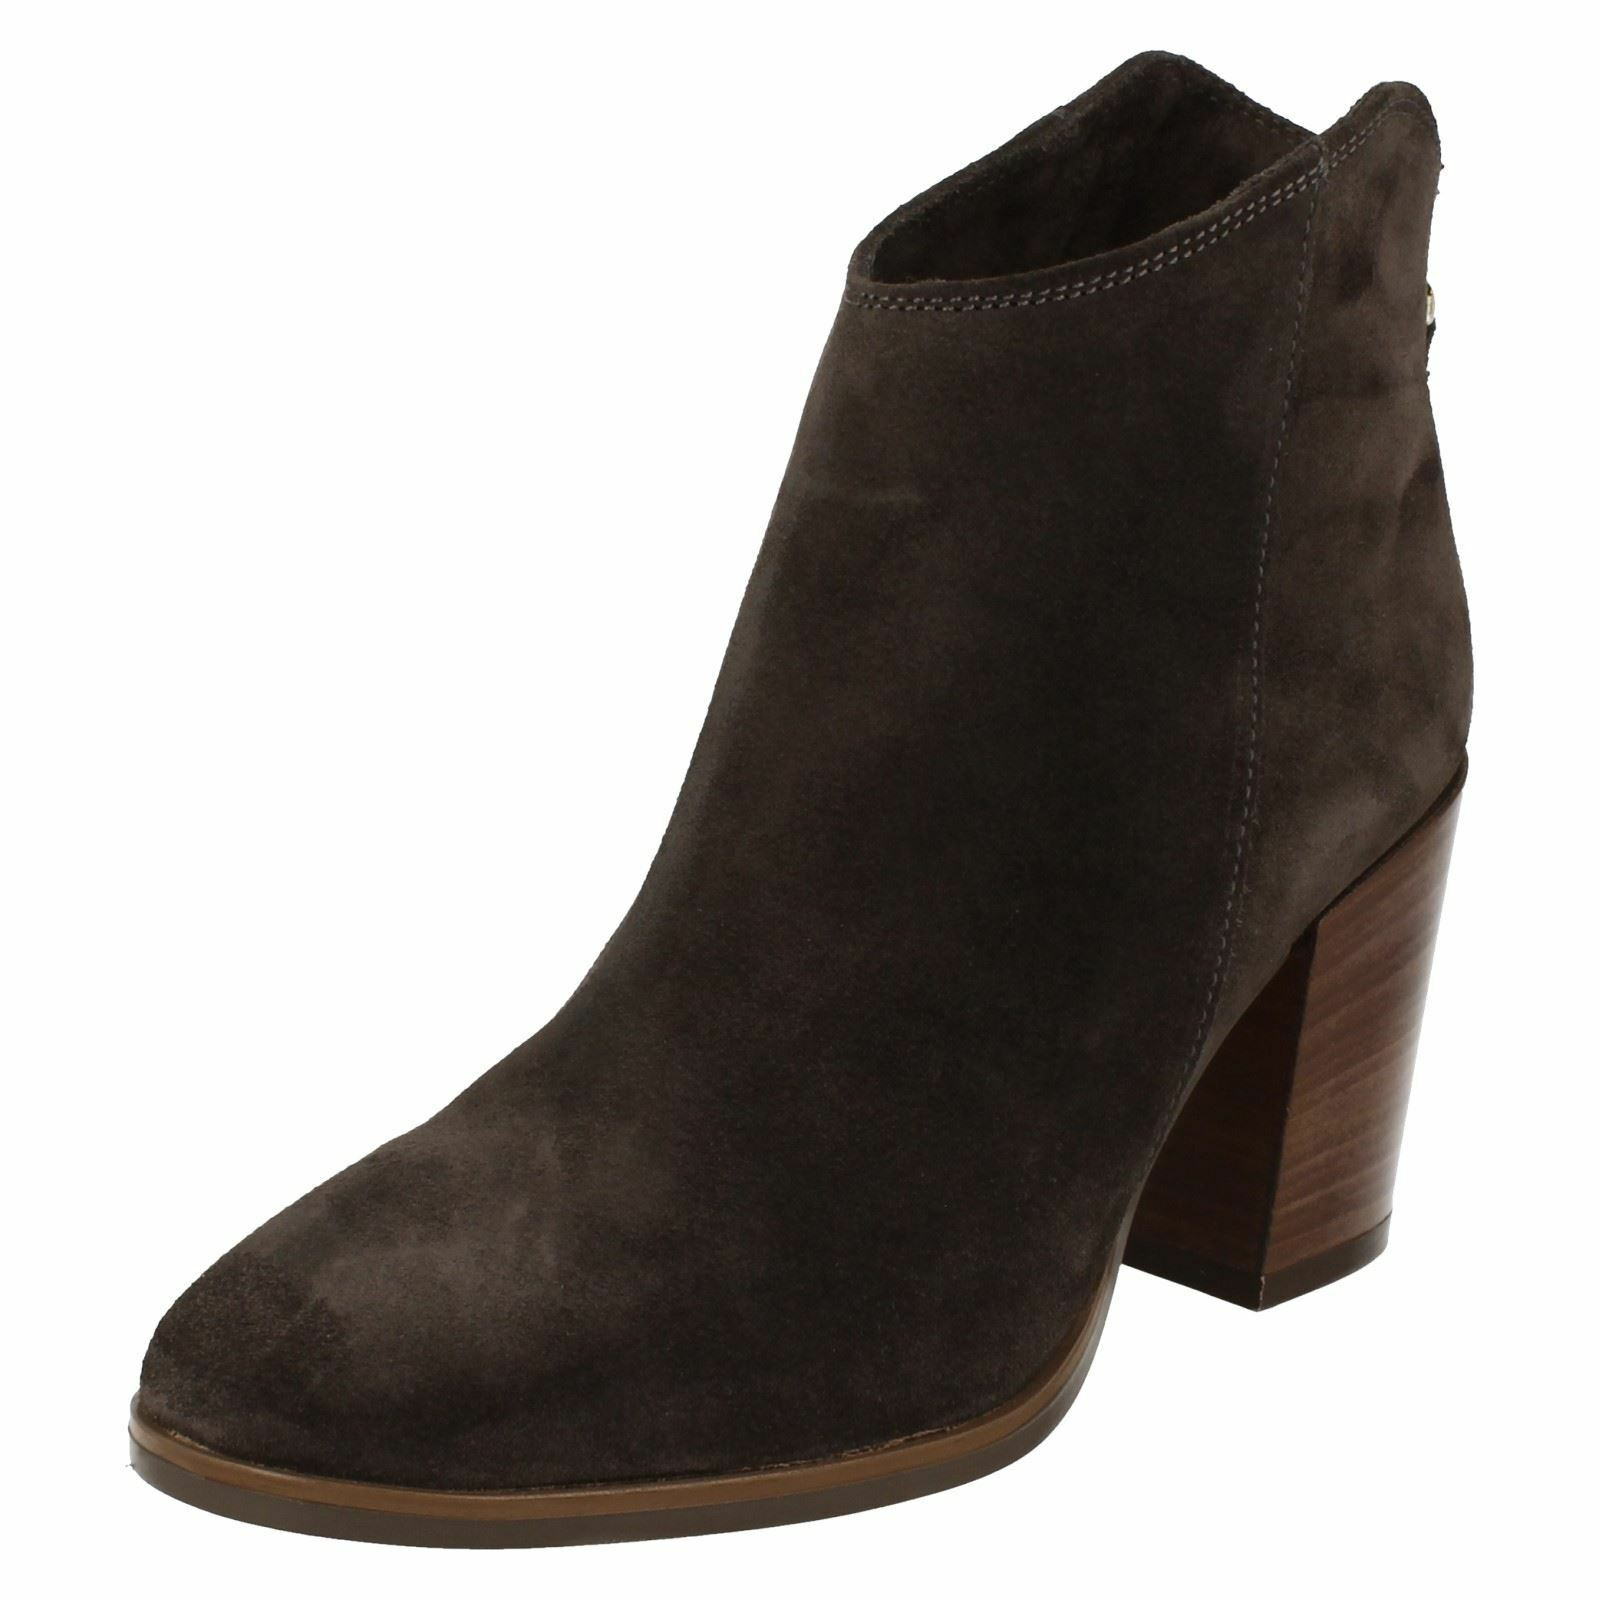 Ladies Clarks High Heel Lora Rear Zip Ankle Boots Lora Heel Lana 6b2b84